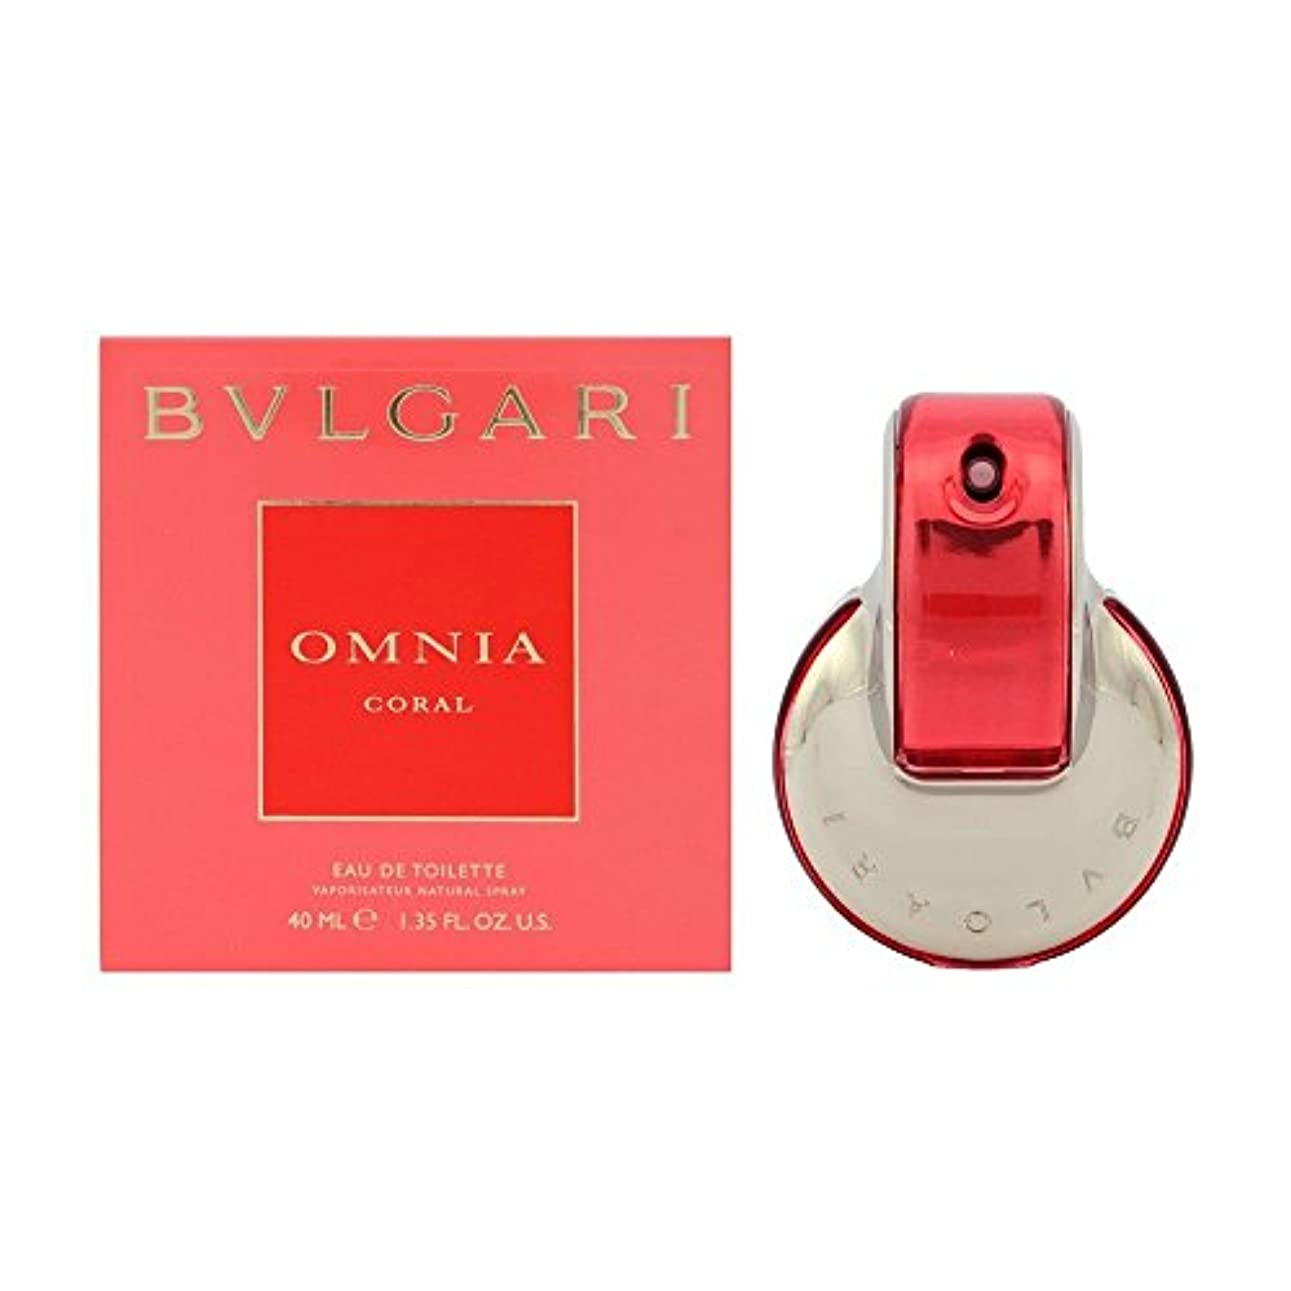 BVLGARI オムニア コーラル レディース 香水 ET/SP/40ml 4033-BV-40 [並行輸入品]